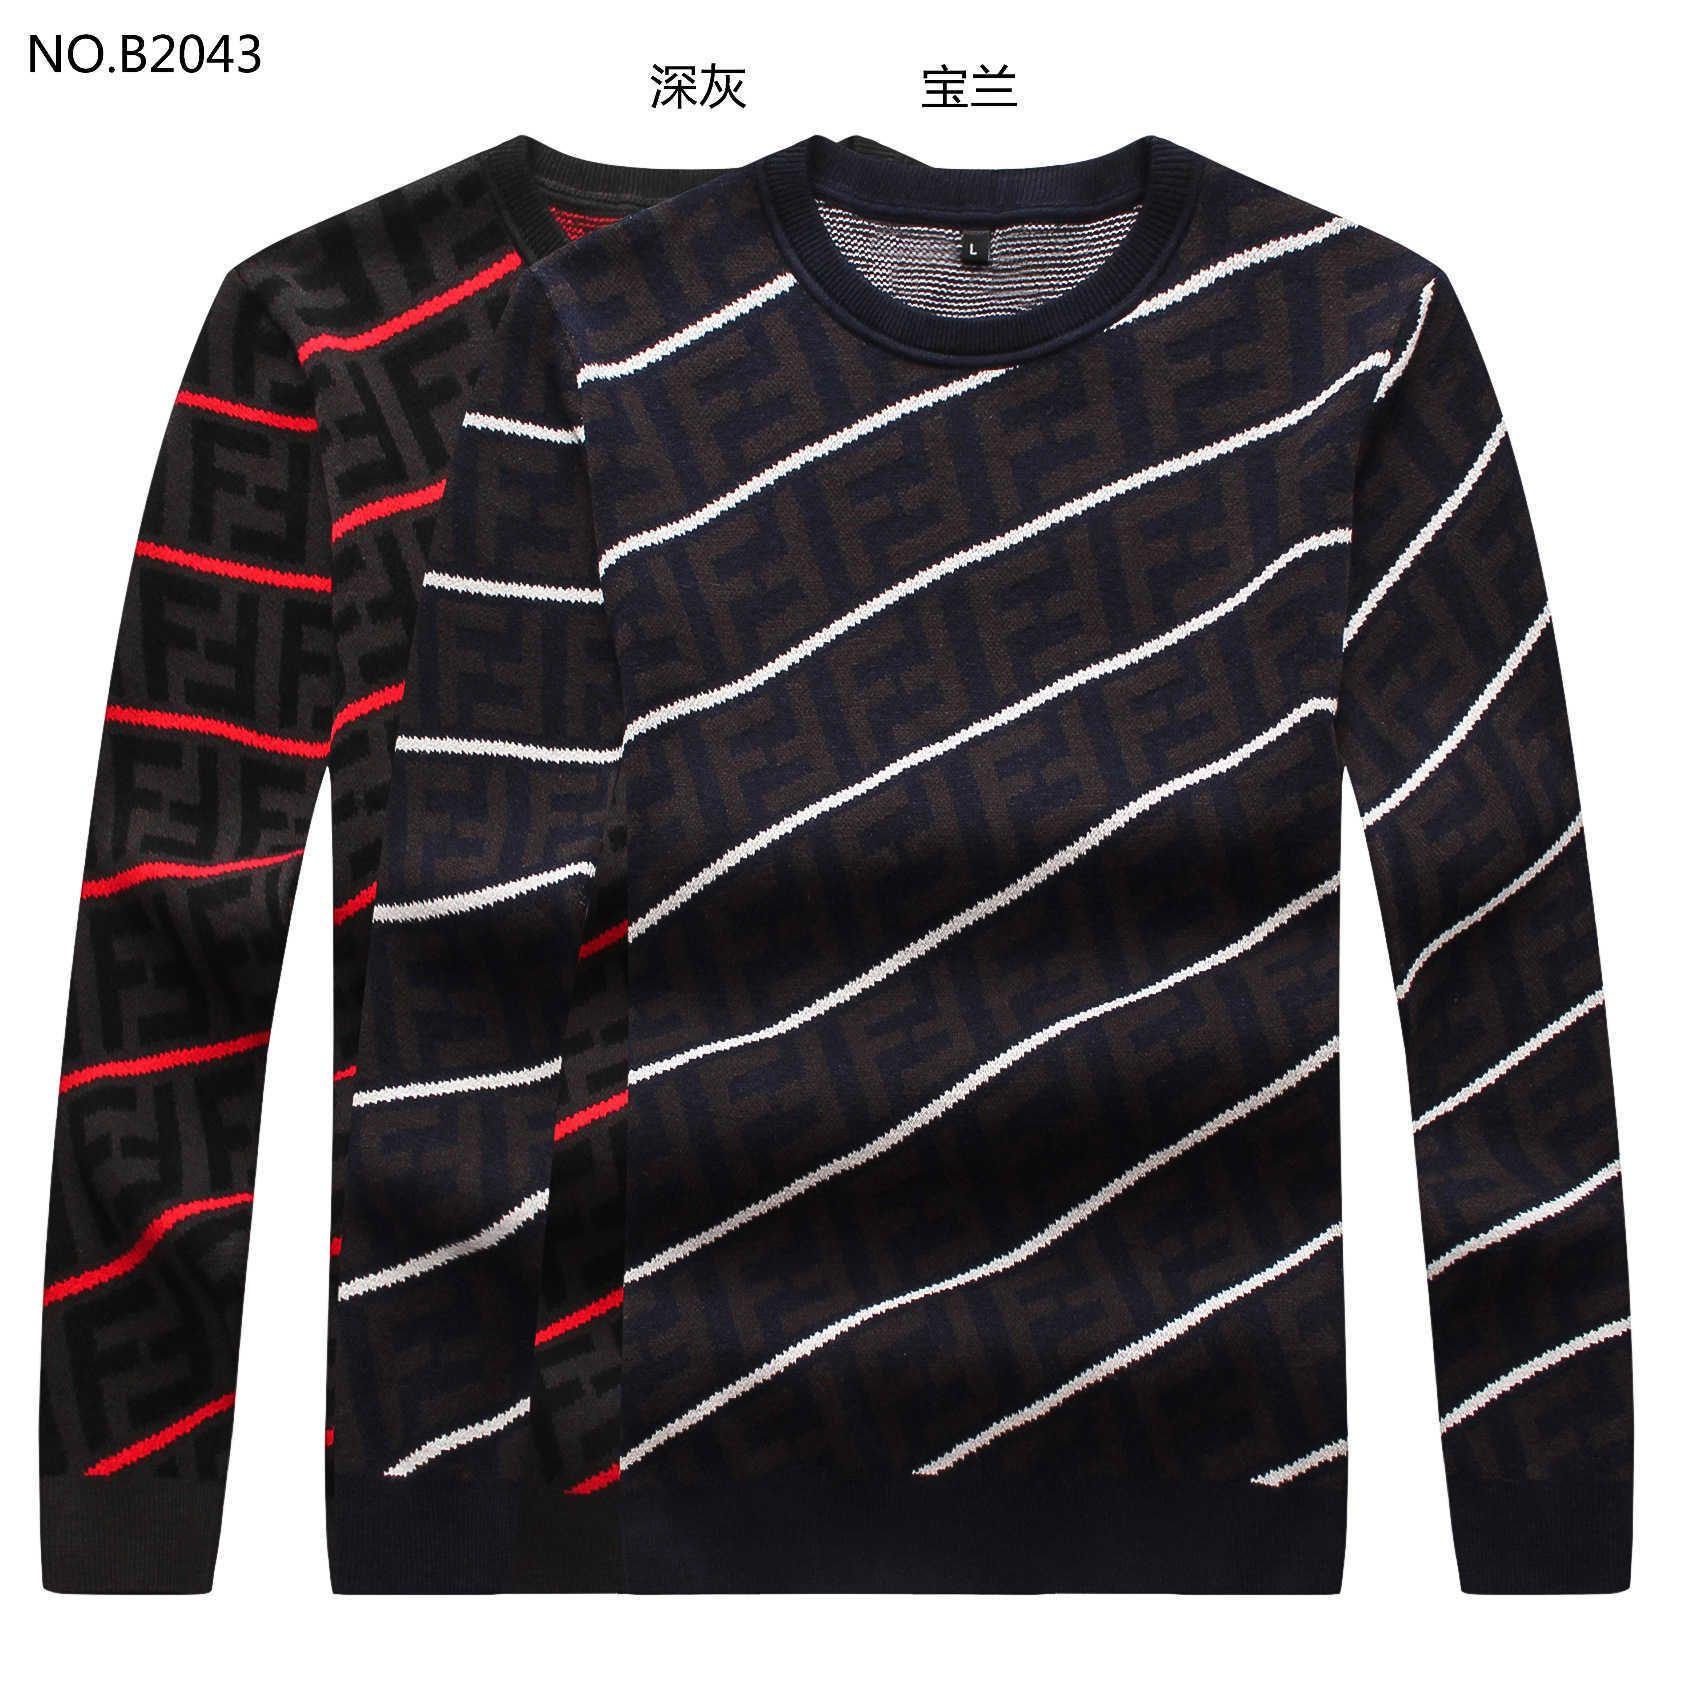 manga larga de 2019 nuevos hombres suéter de punto 191020399688